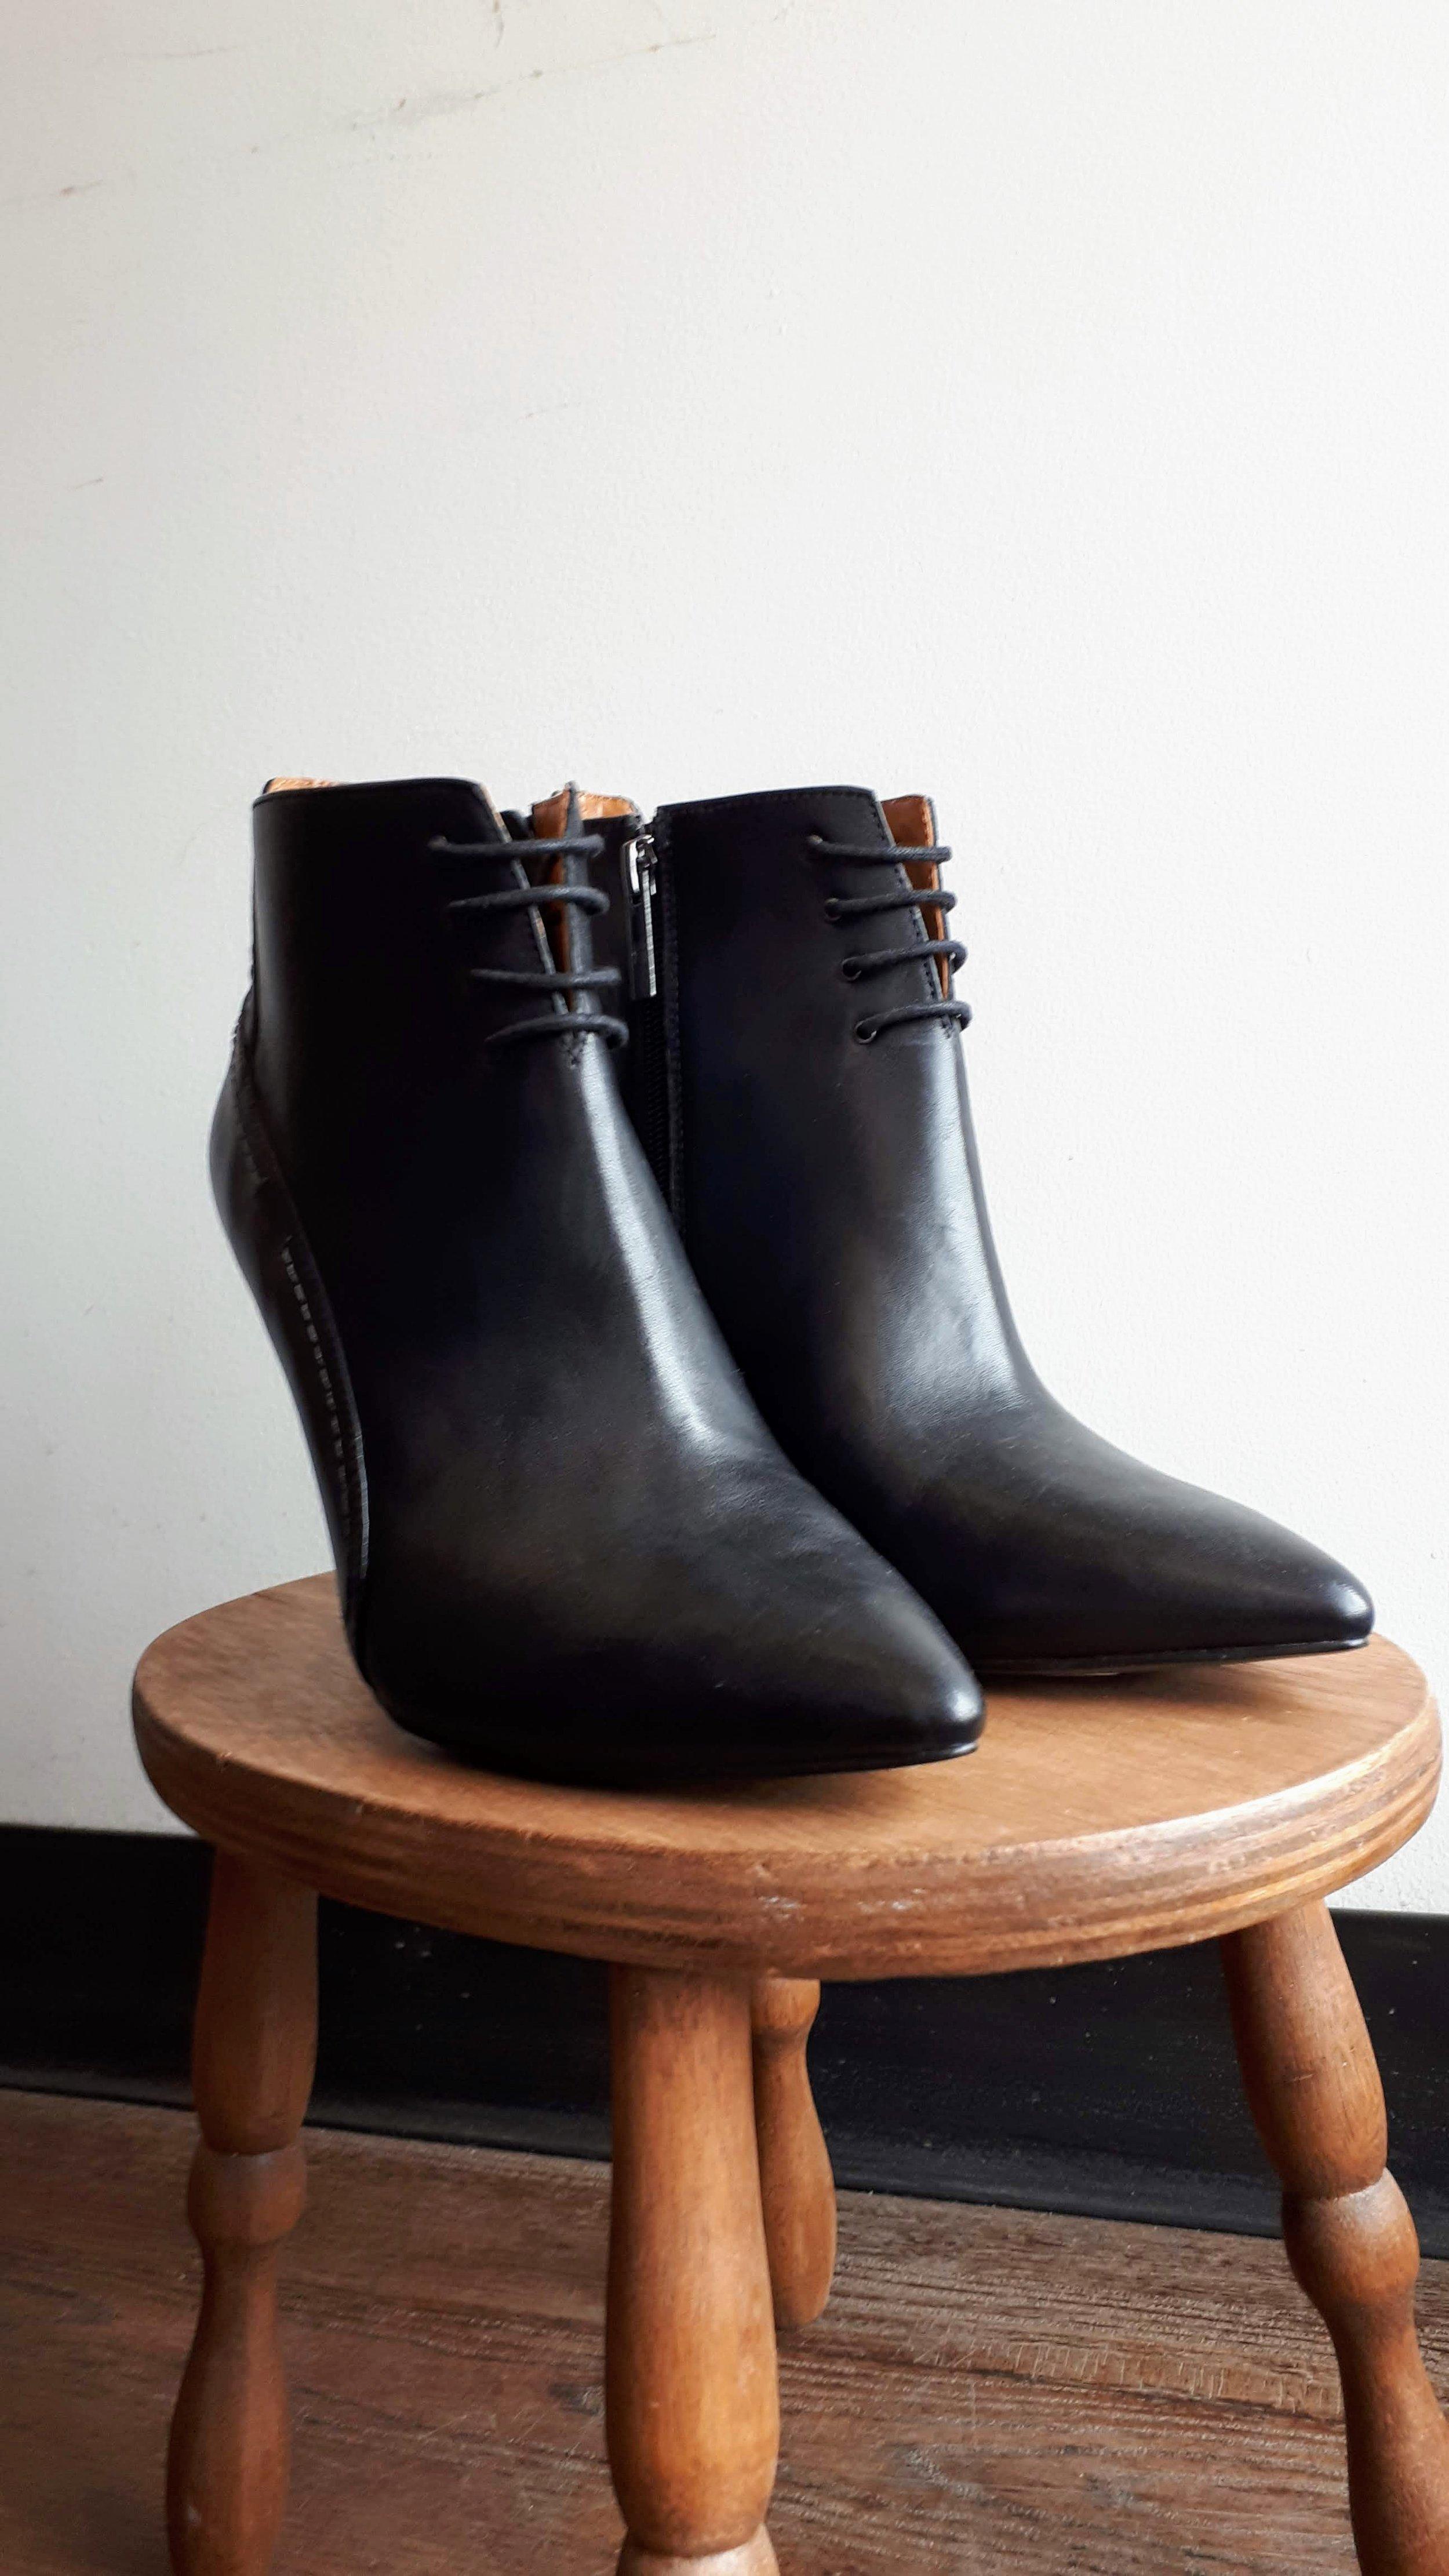 Halston boots; S8.5, $175